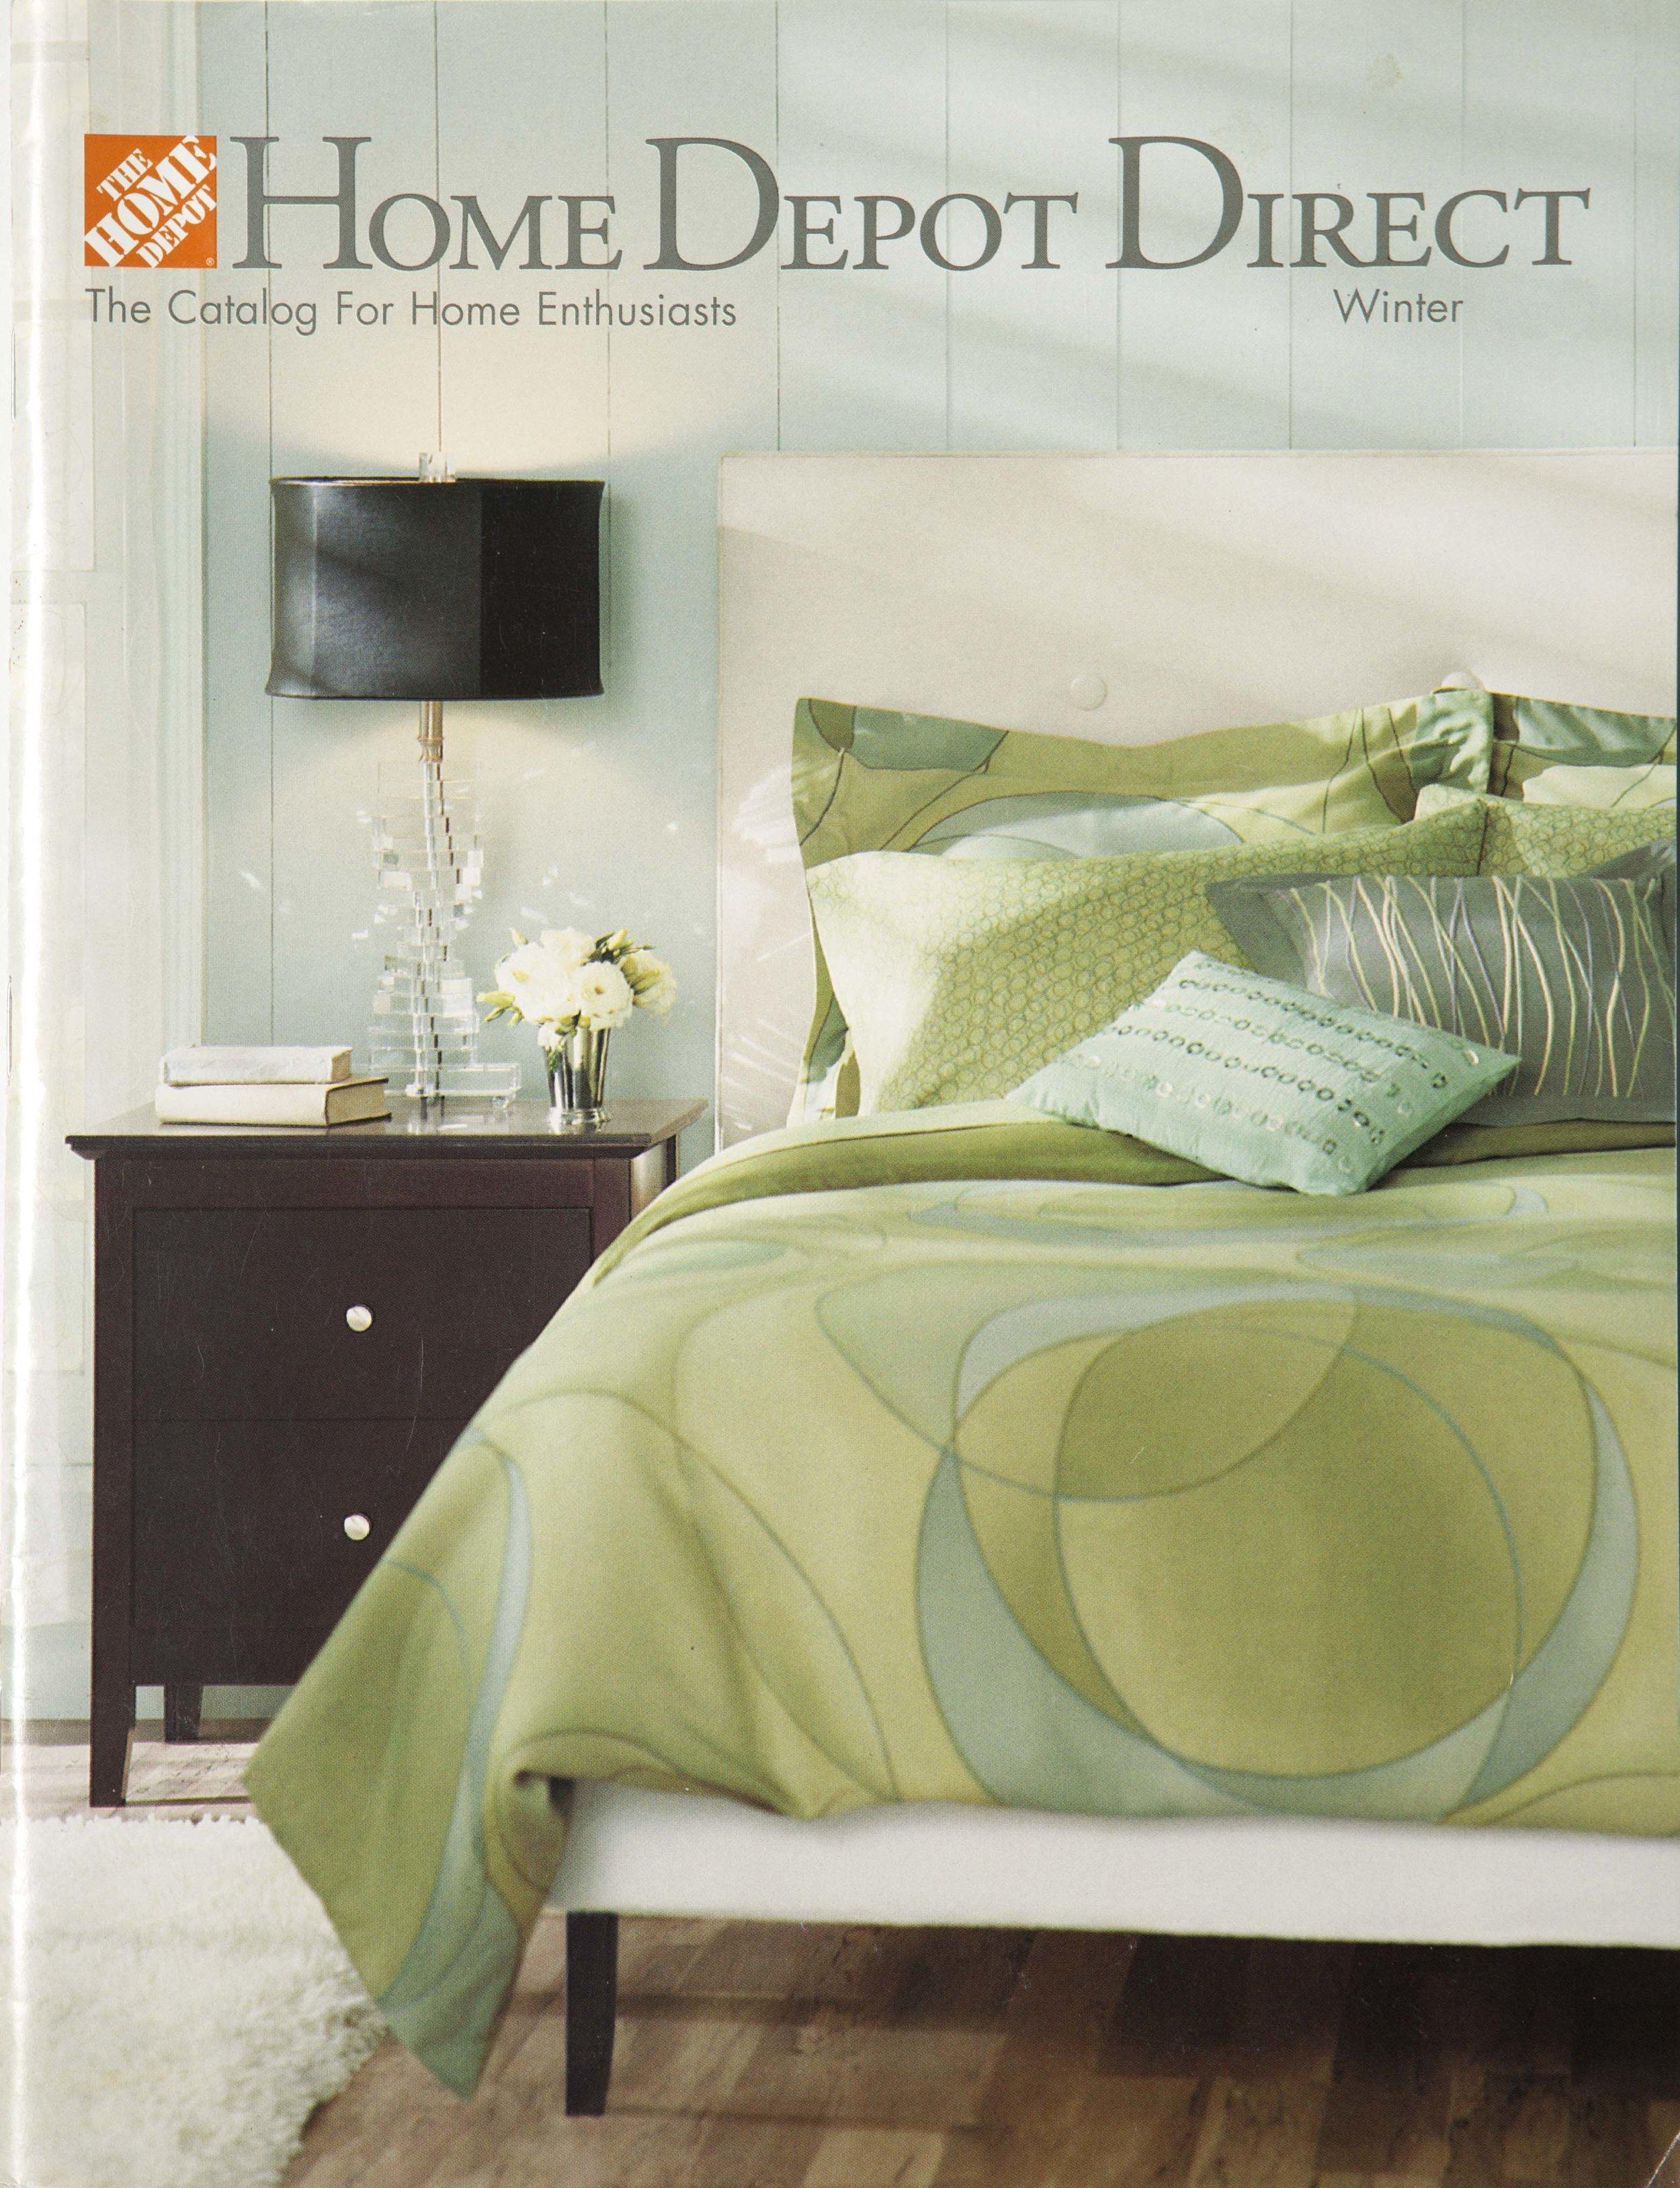 Home Depot Cover_U7C7592.jpg